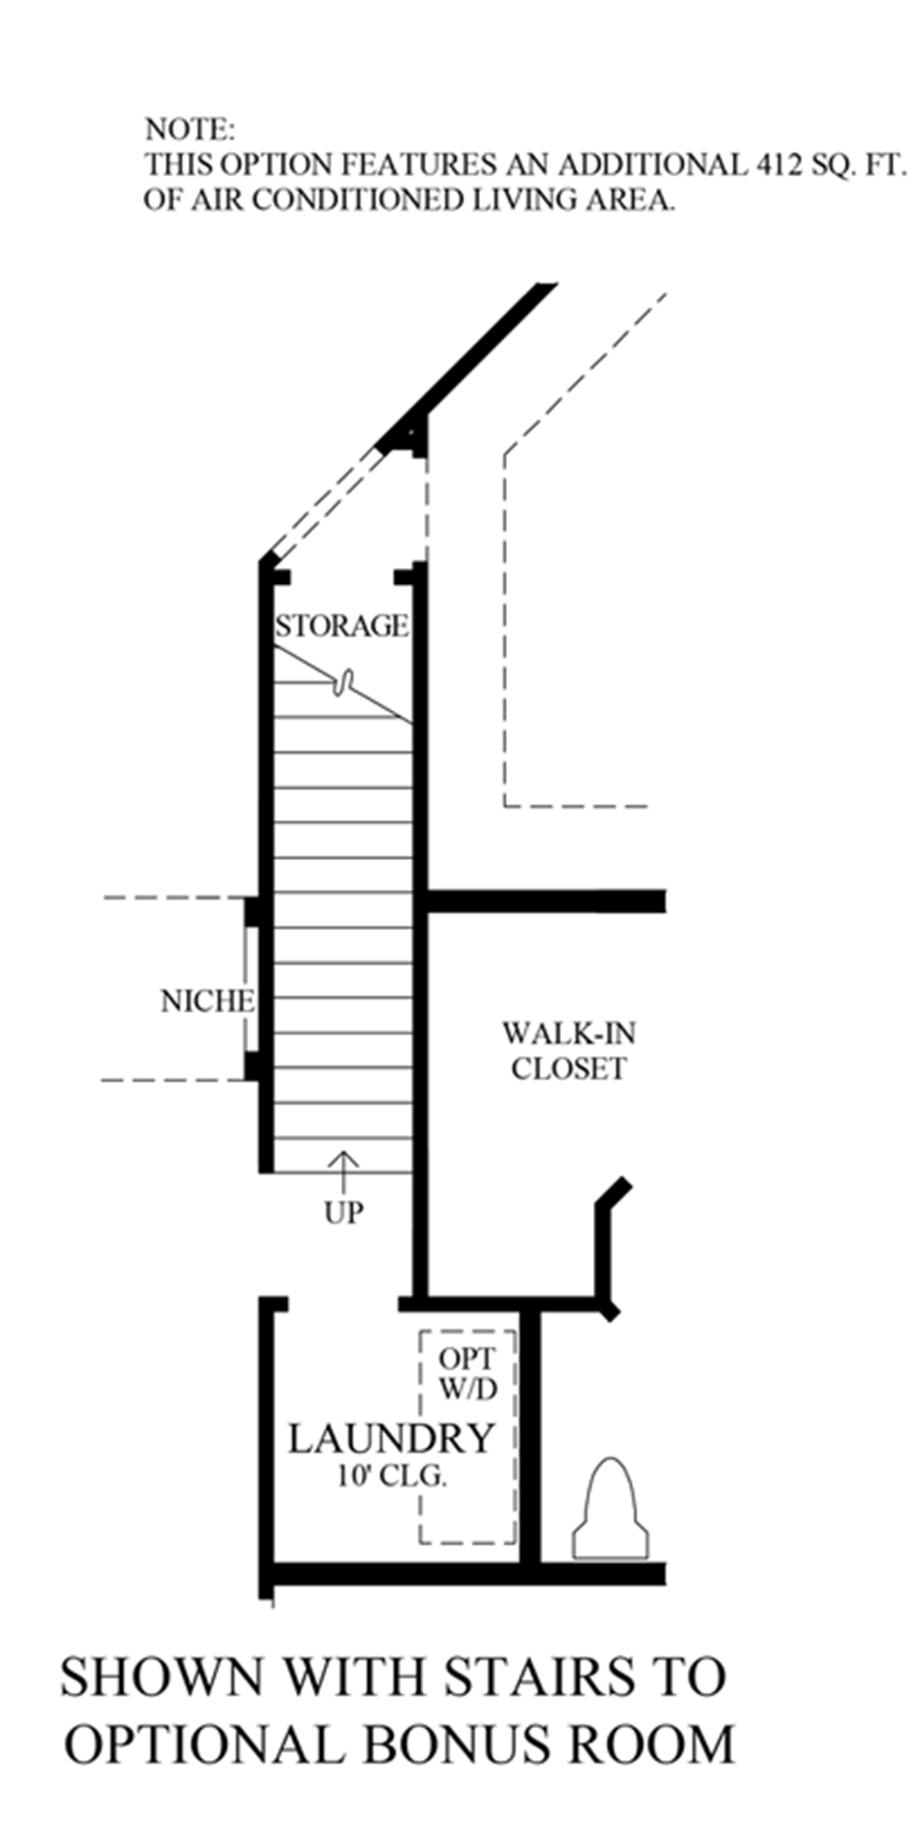 Stairs to Optional Bonus Room Floor Plan